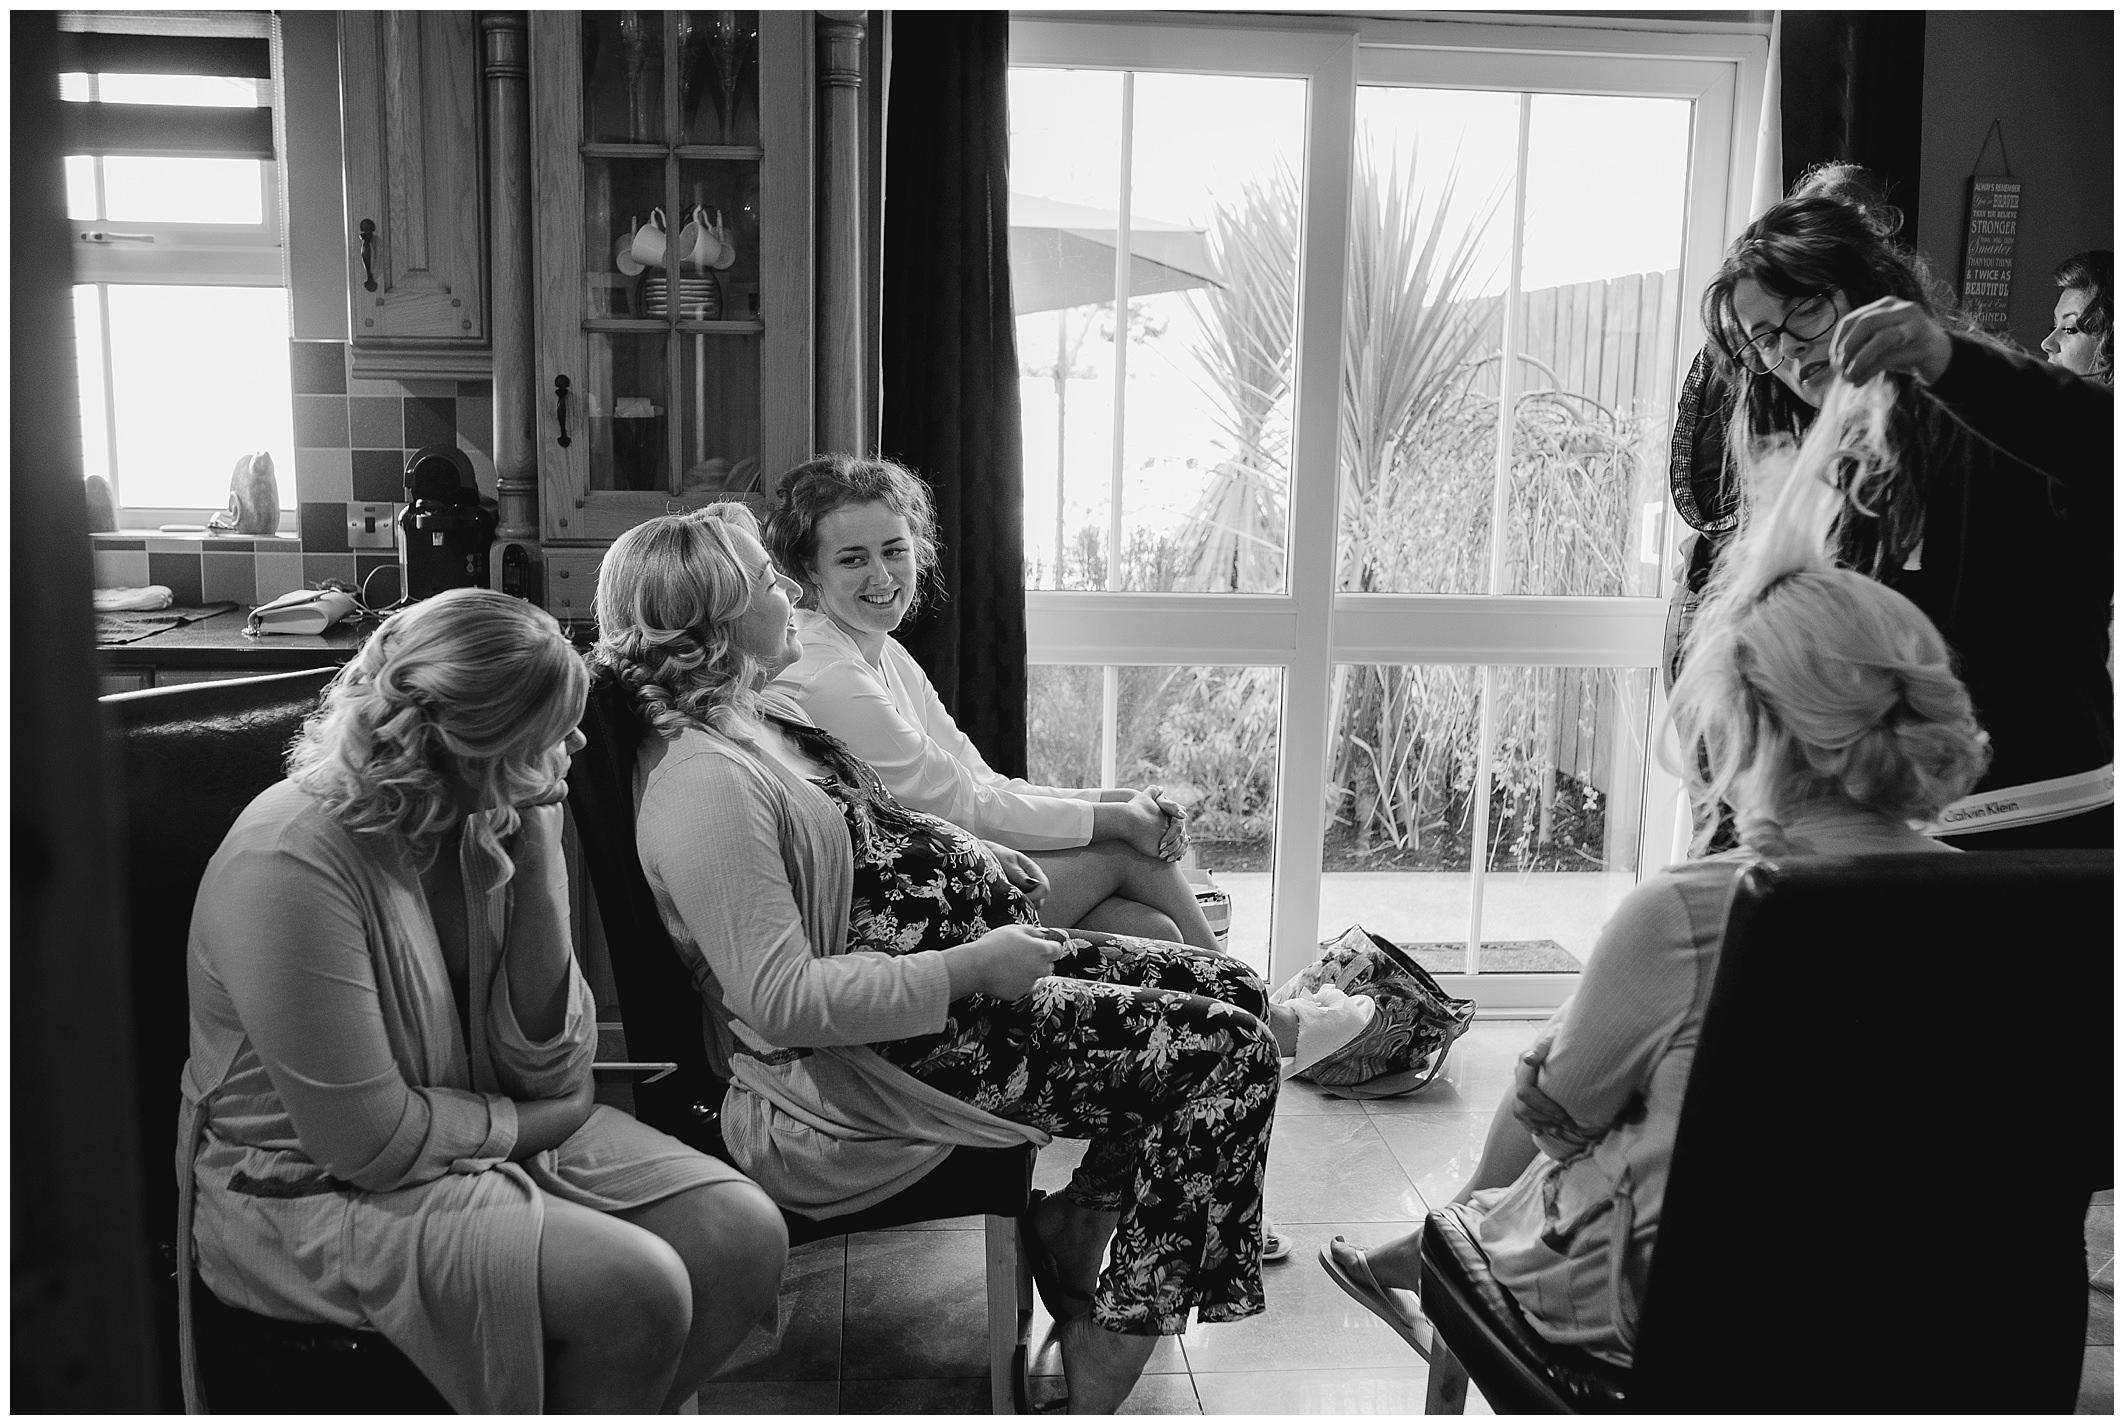 corick-house-wedding-hannah-gary-jude-browne-photography_0005.jpg